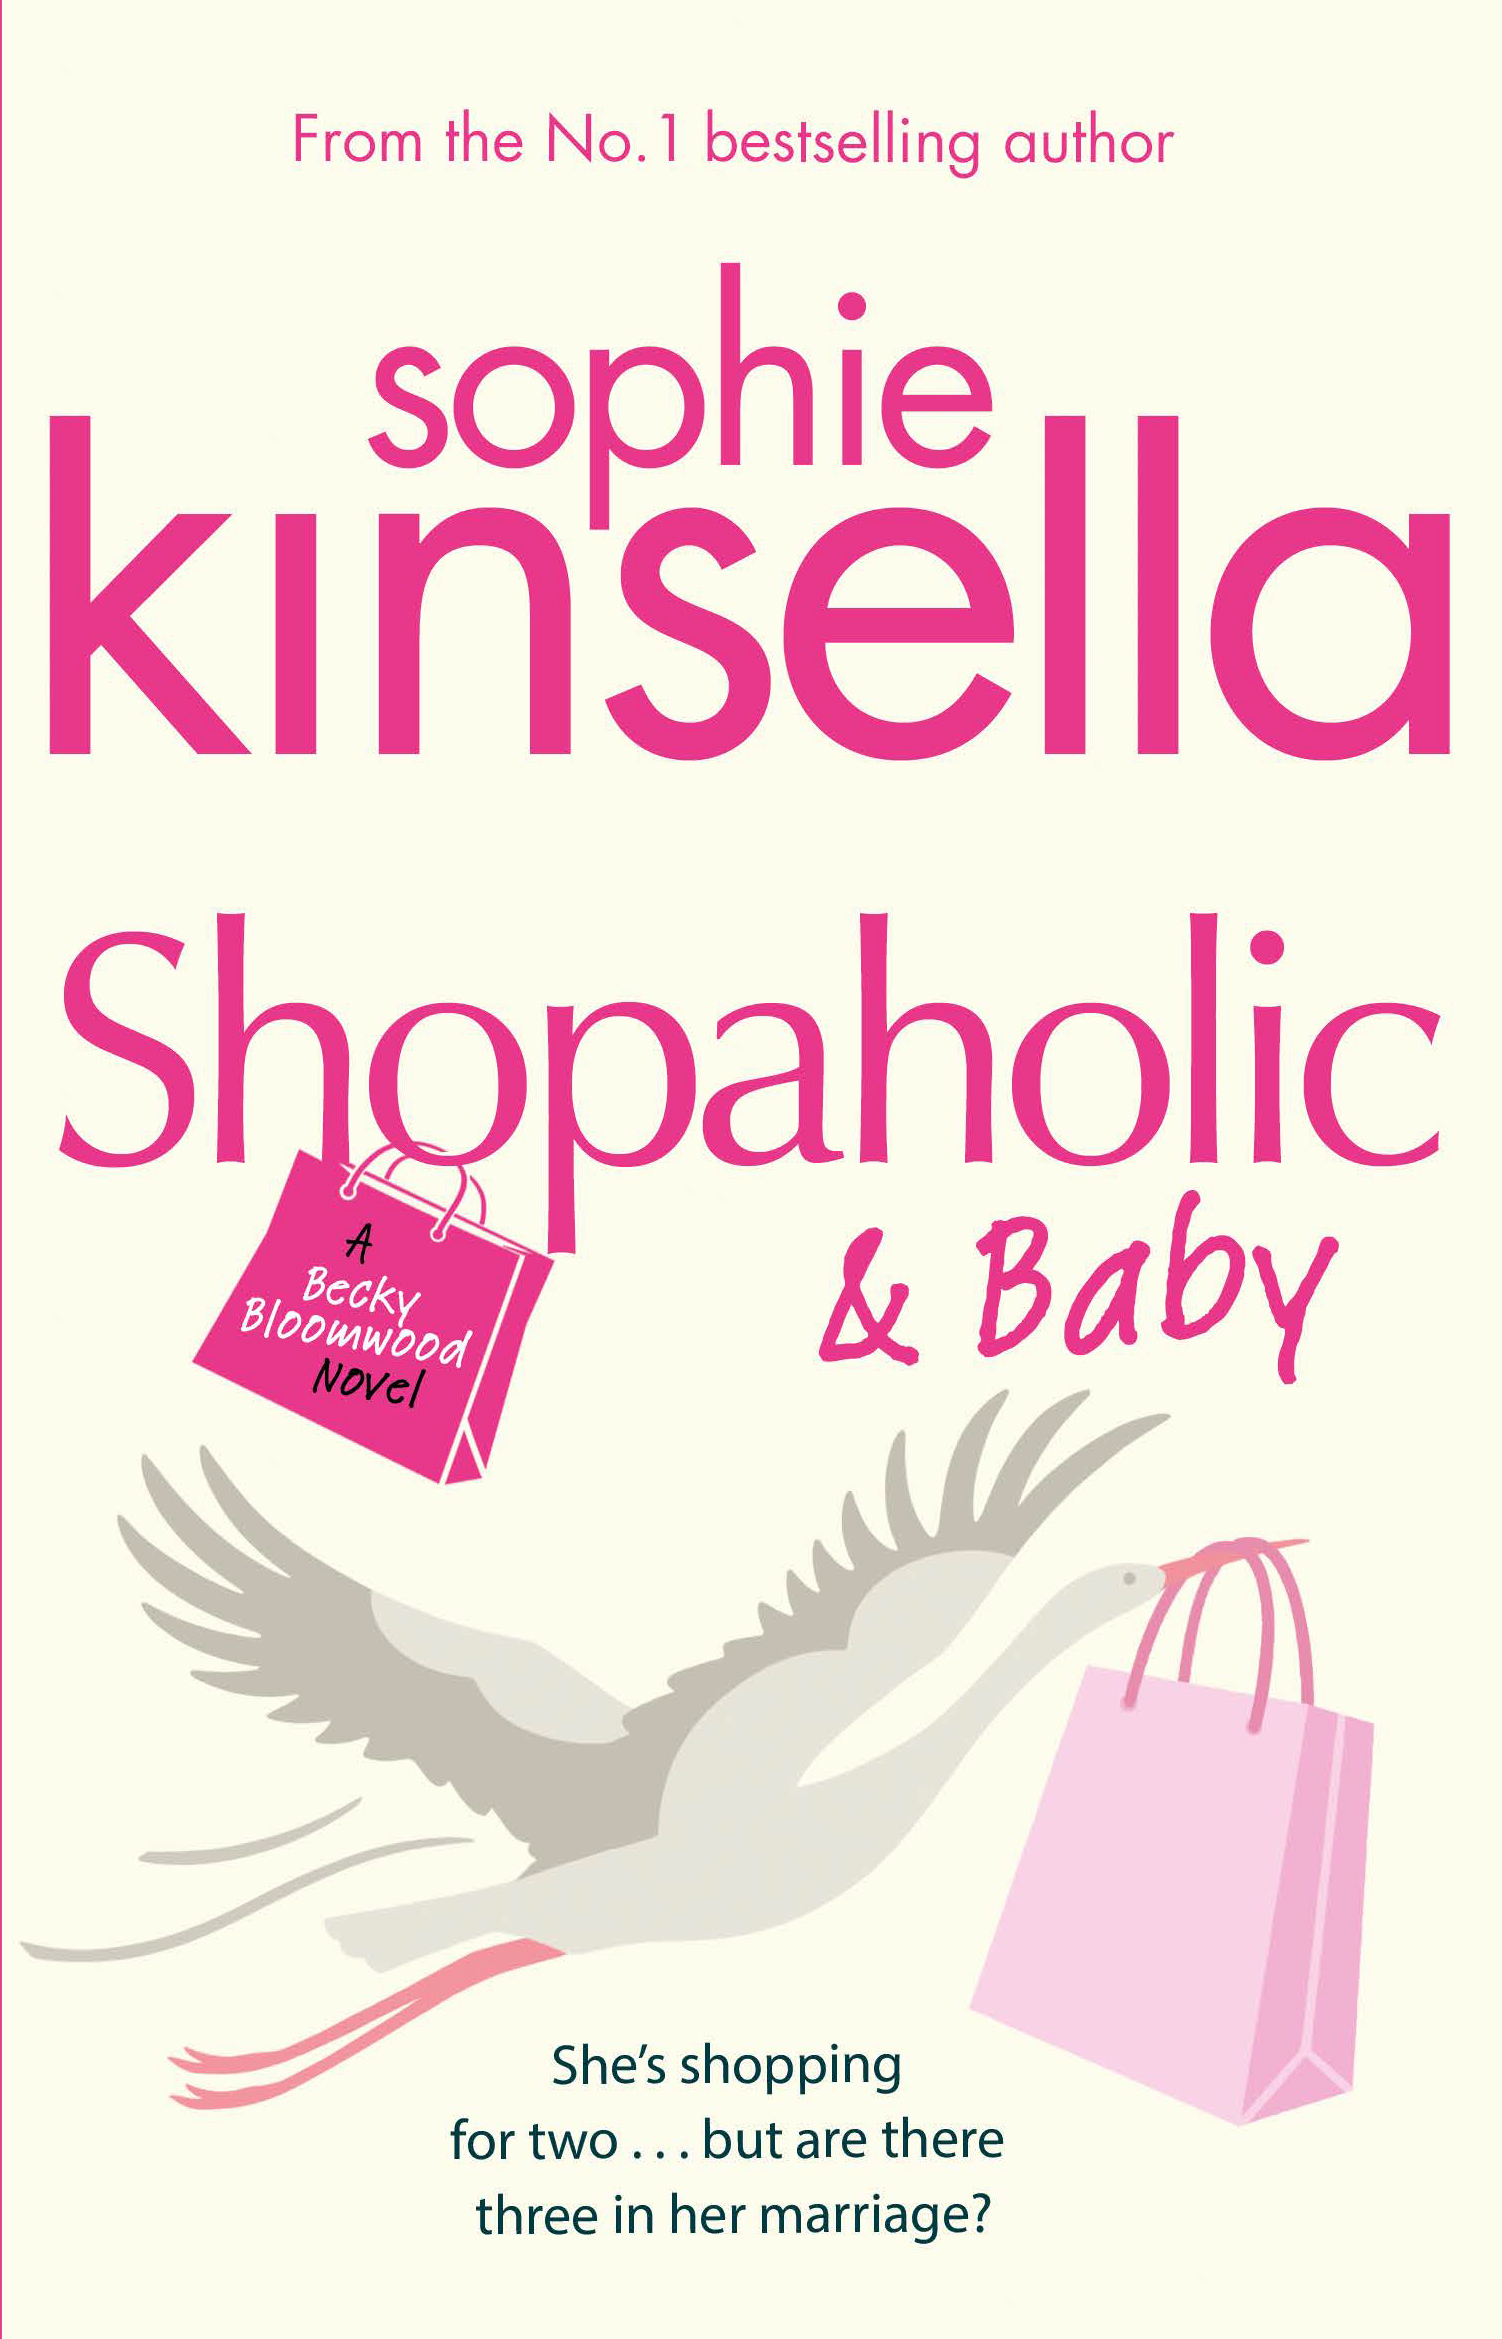 5. Shopaholic & Baby